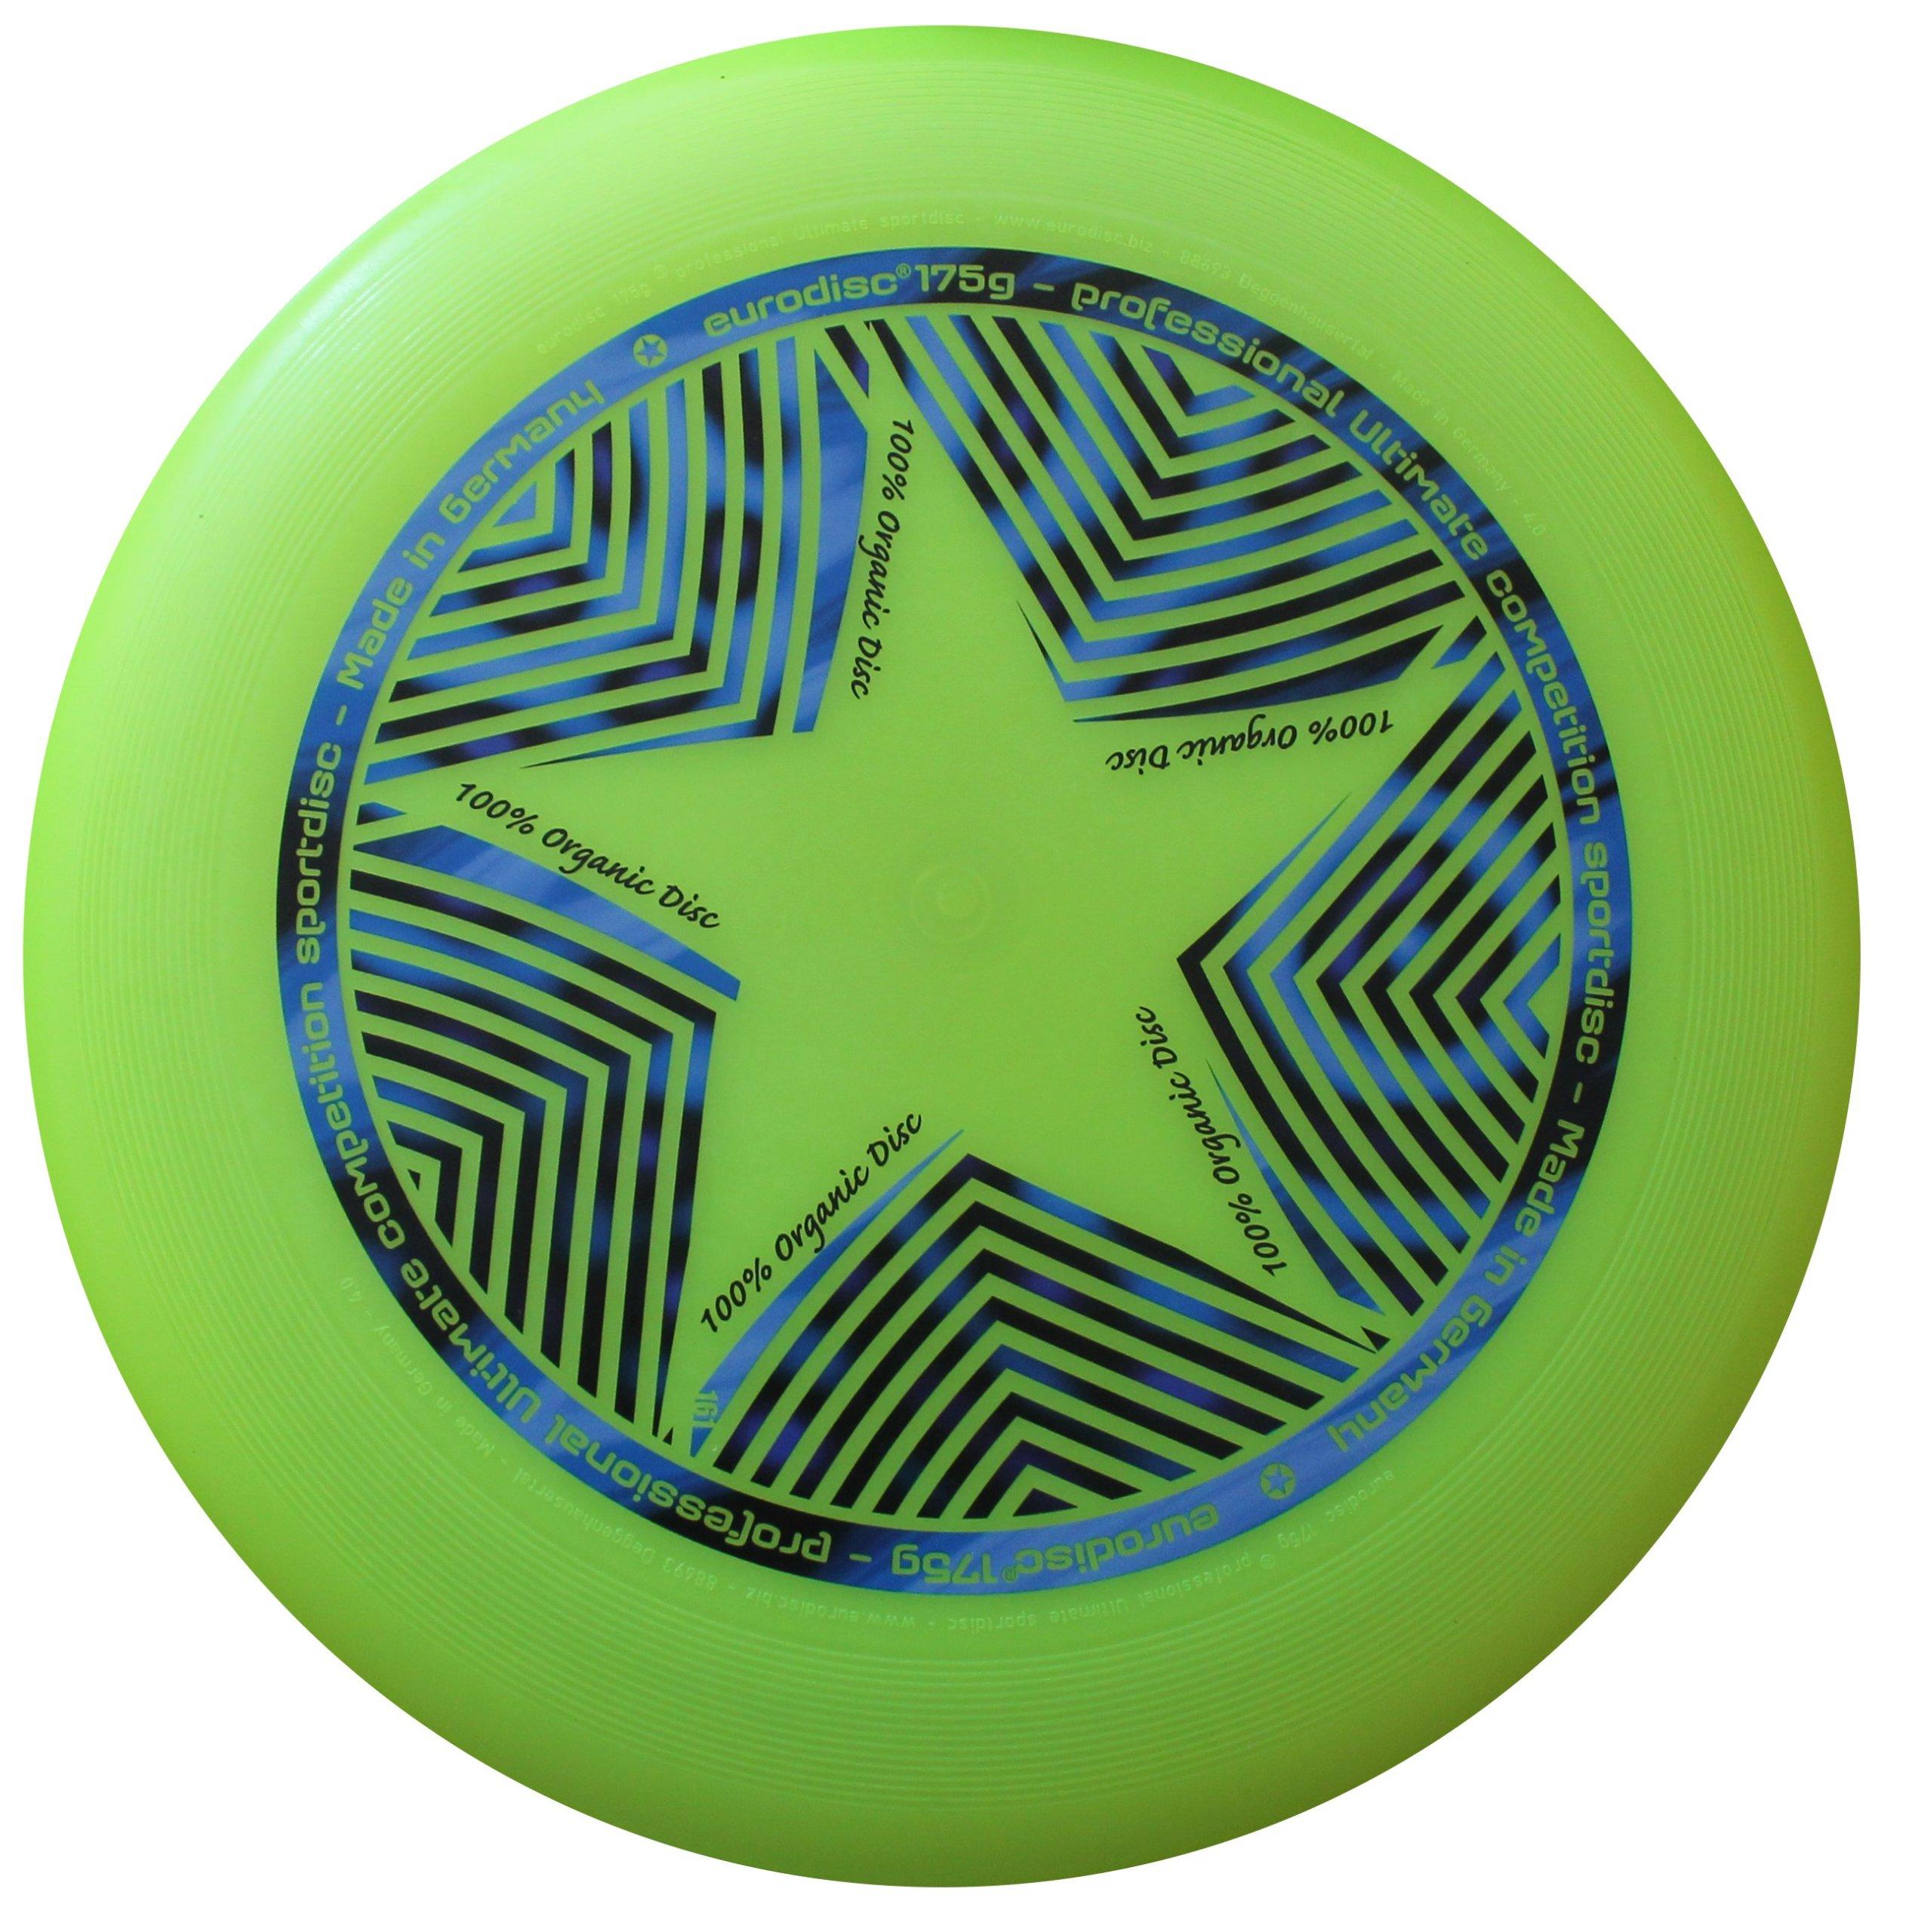 Frisbee-pay — легкие платежи в интернете